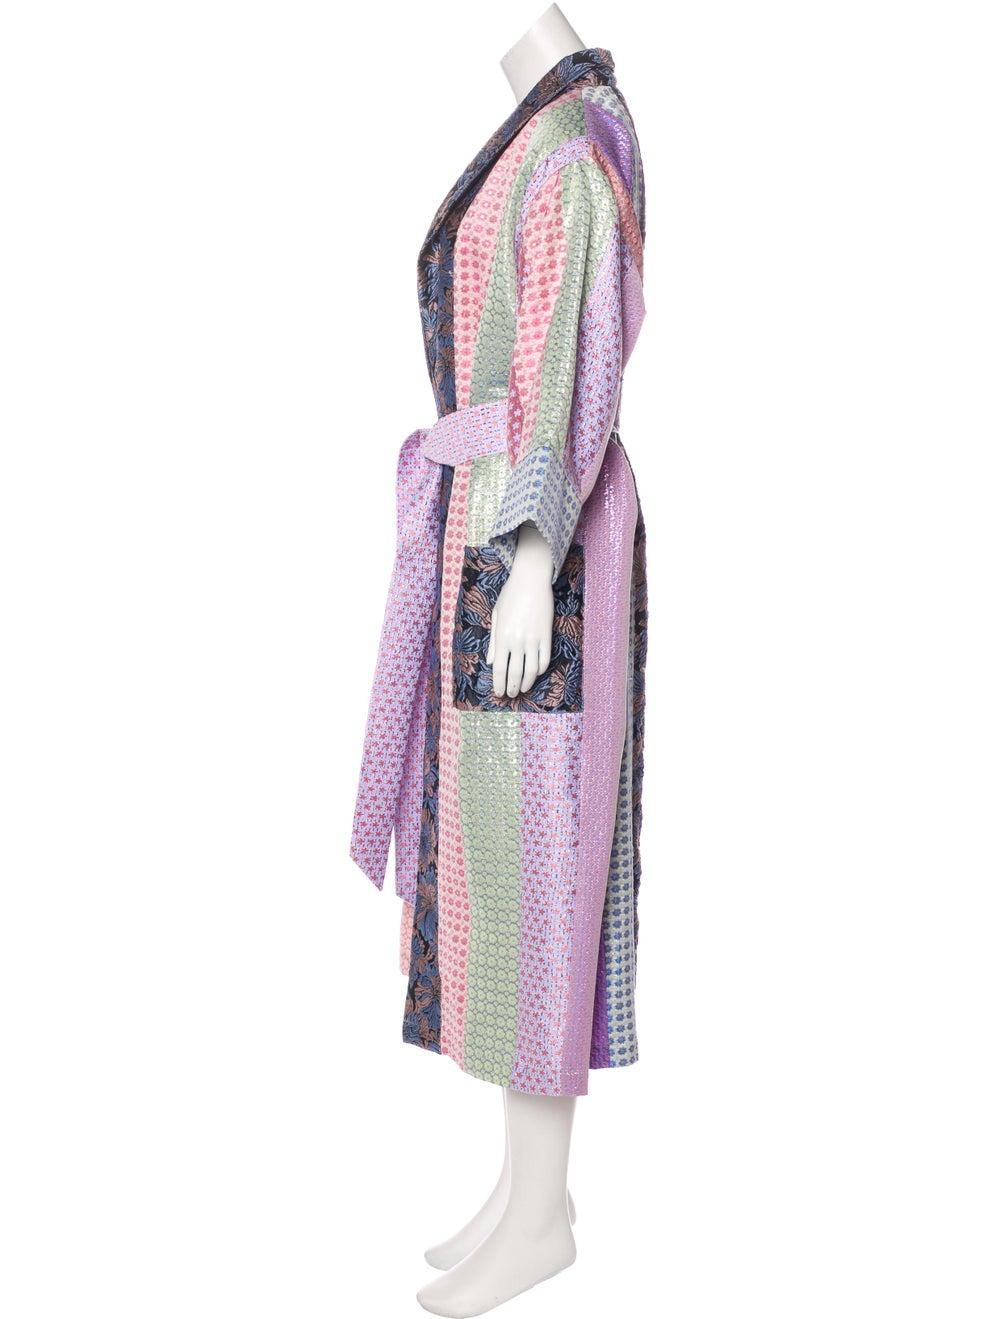 Natasha Zinko Patchwork Brocade Robe Pink - image 2